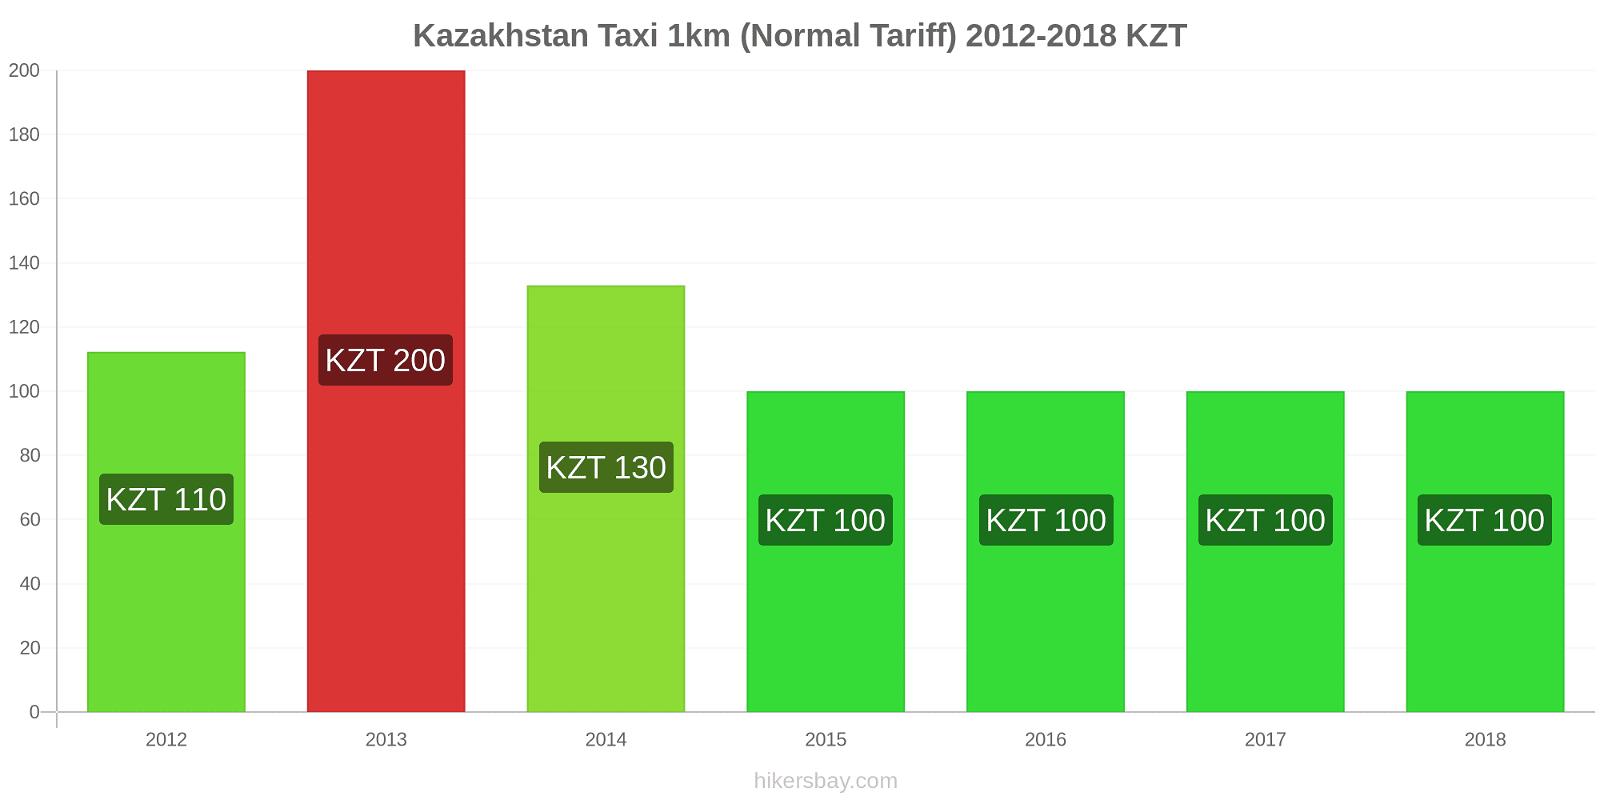 Kazakhstan price changes Taxi 1km (Normal Tariff) hikersbay.com